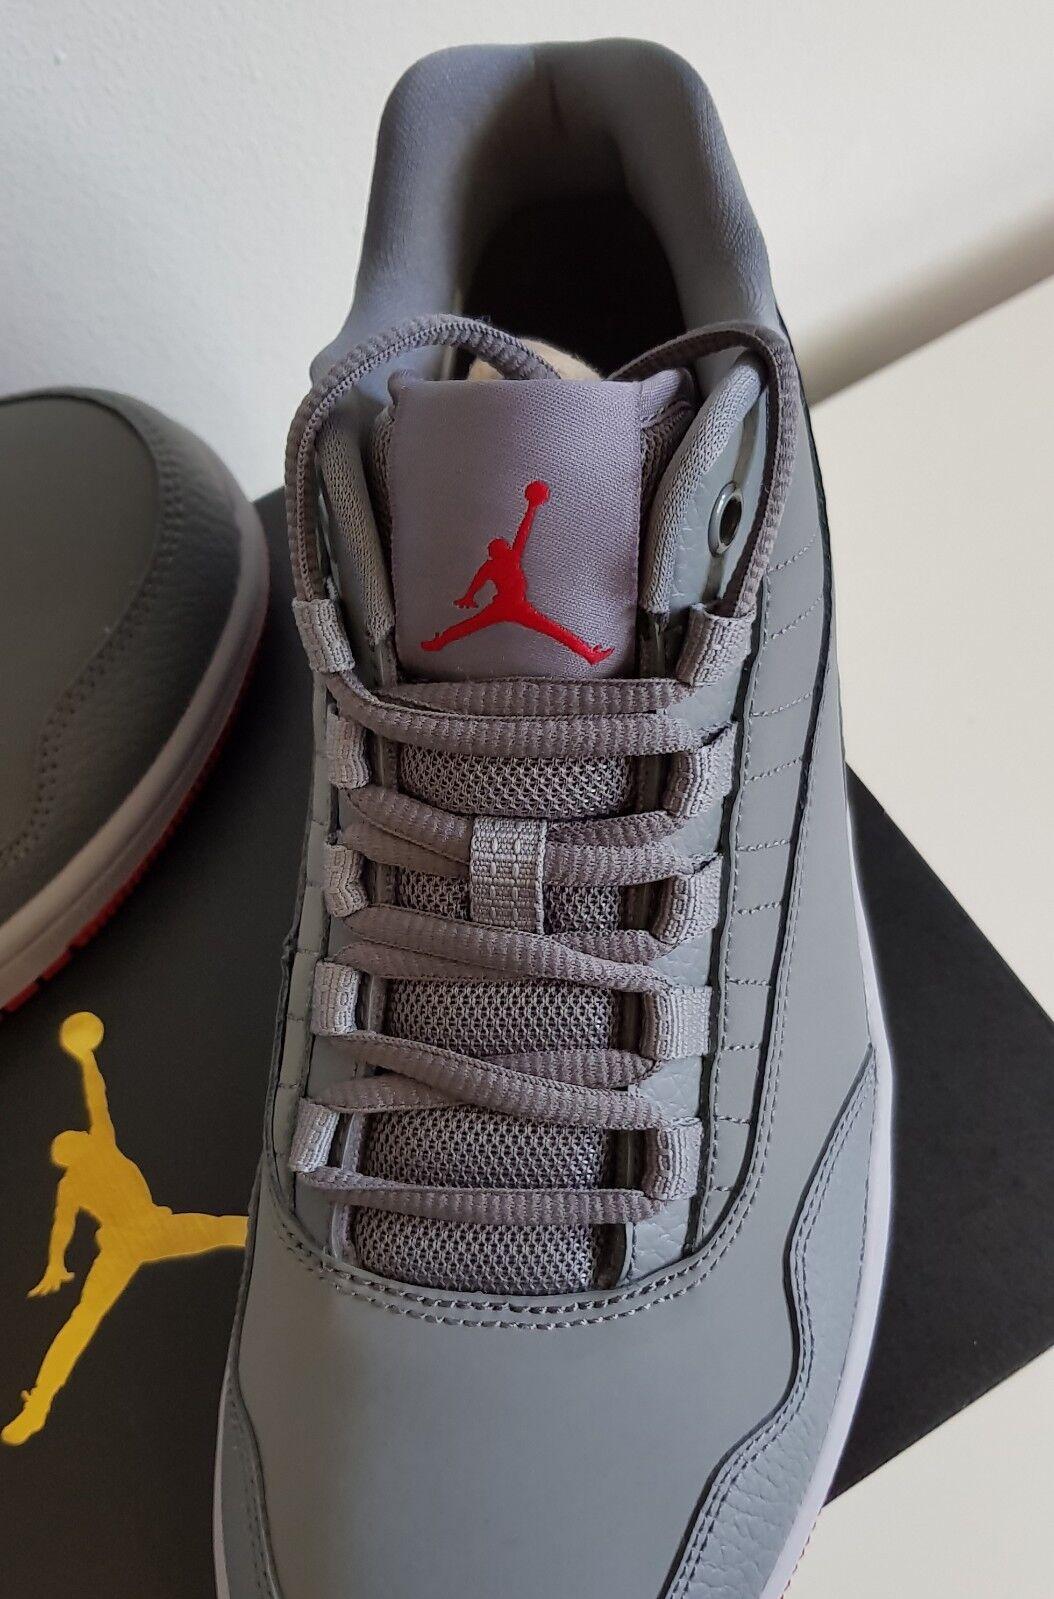 Nike Air Jordan Executive Mens Basketball Basketball Basketball Trainers Sneakers 833913-004 0f0f4b